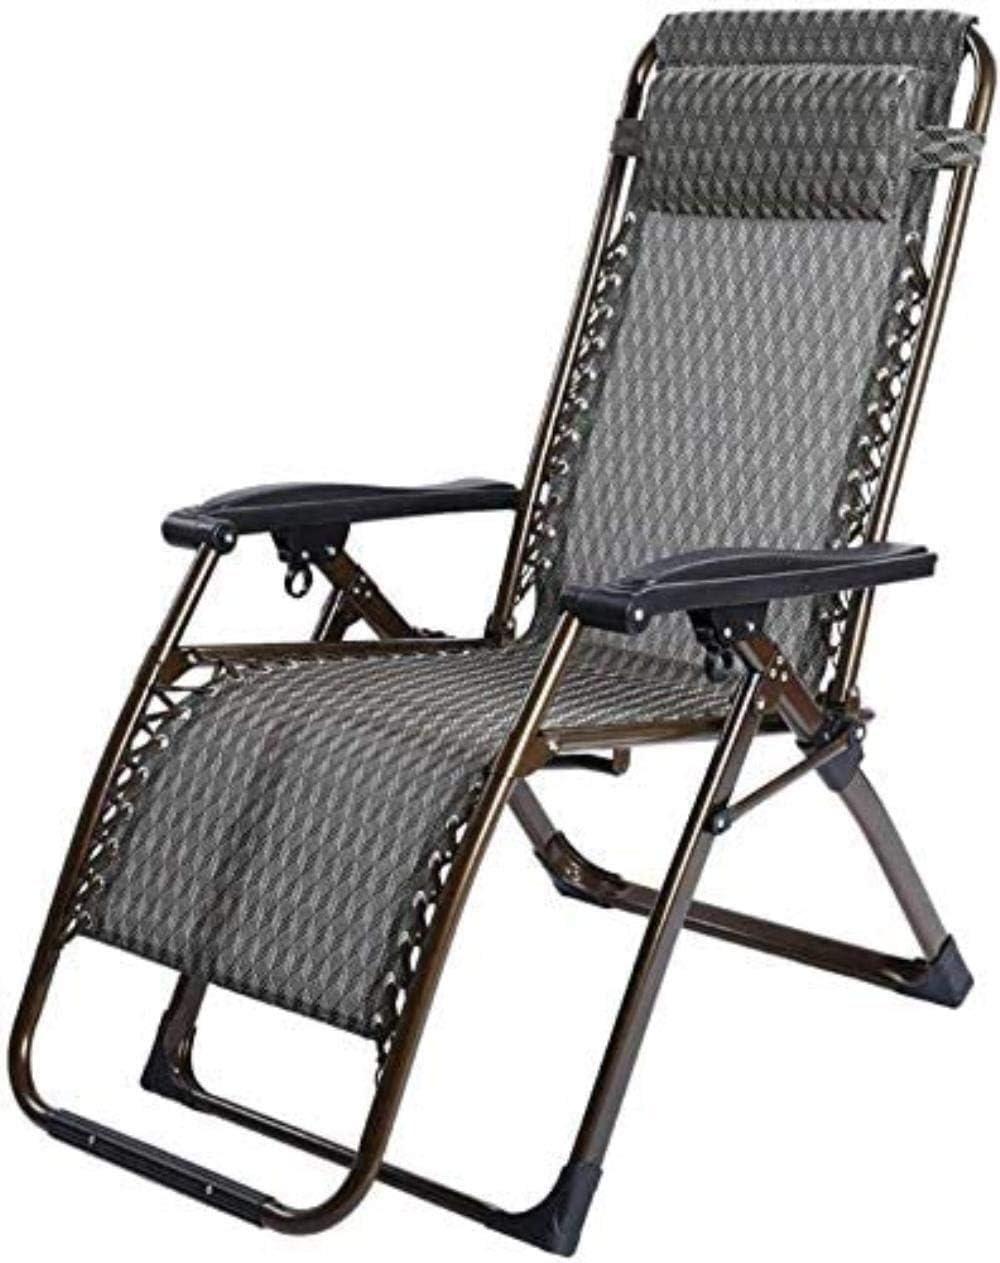 Silla Sillones reclinables Tumbona, sillones, Plegables Gravedad Tumbona reclinable Mecedora del jardín Cama reclinable Brazos Plegables xiuyun (Color : Wave, Size : 72 * 68 * 112cm)